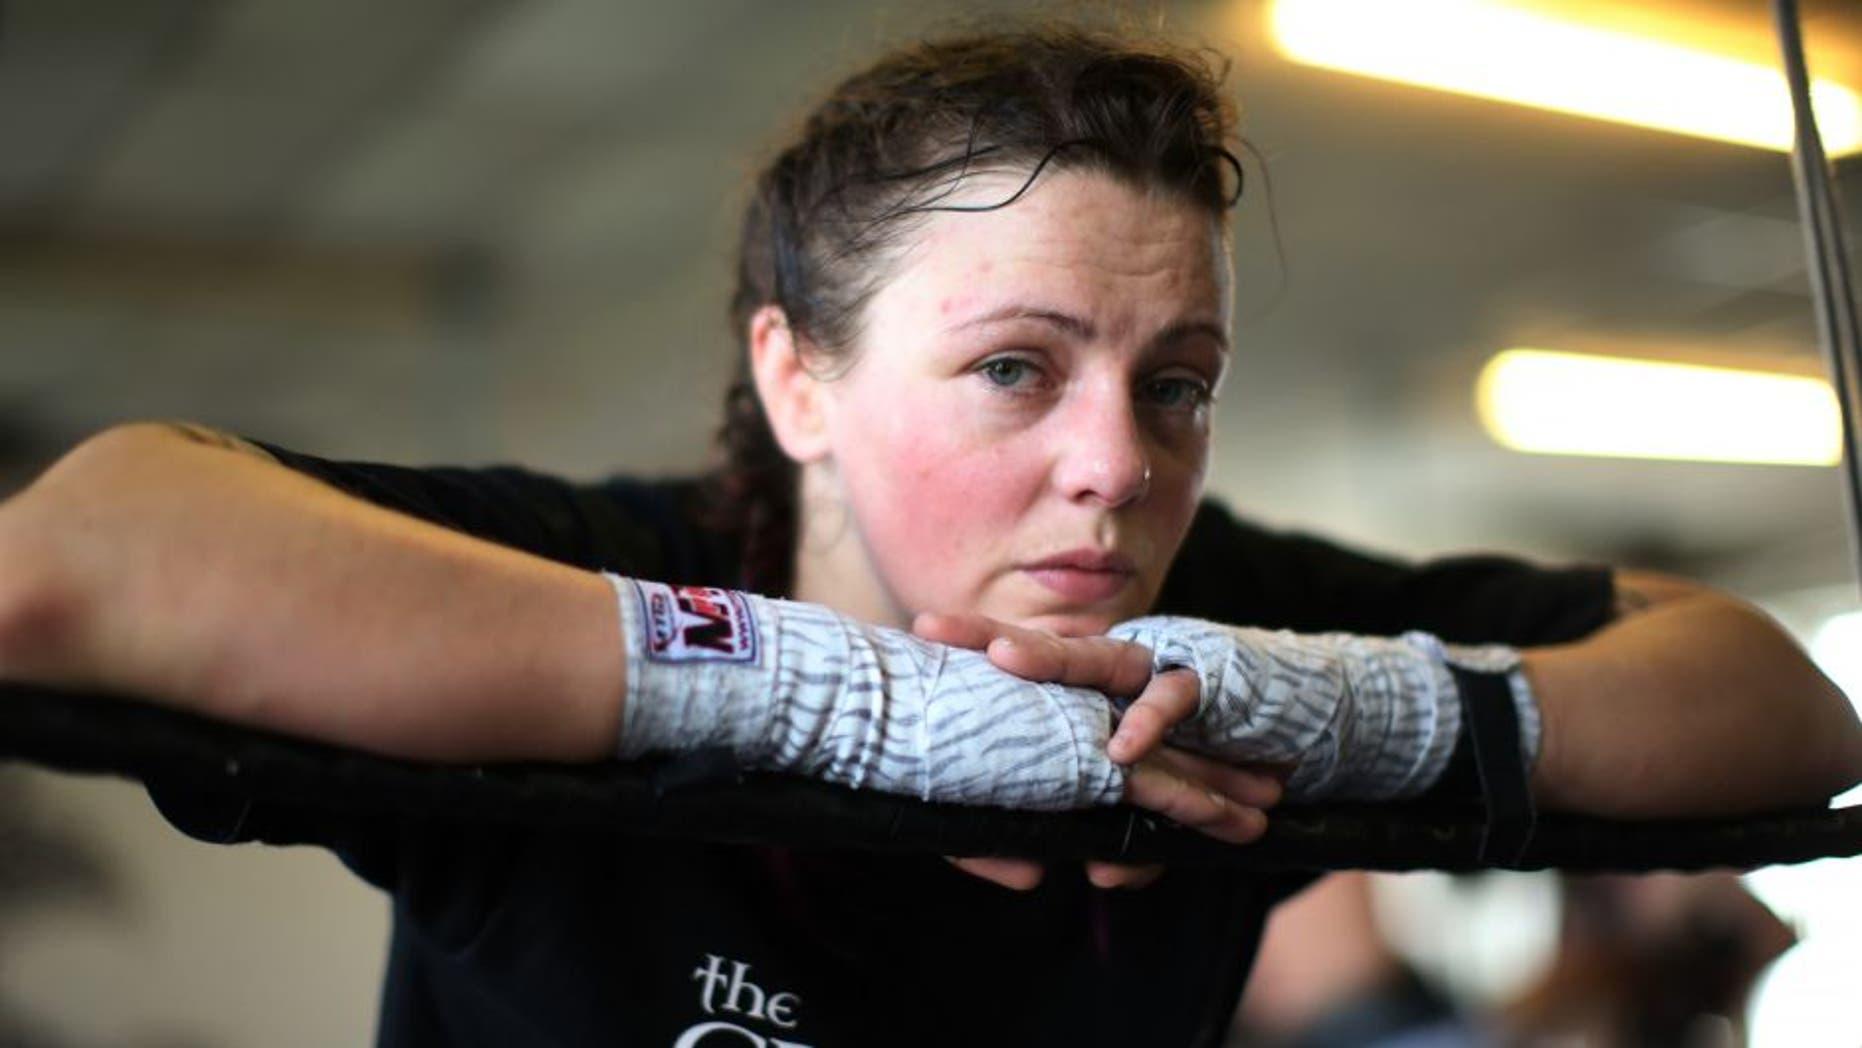 GLASGOW, SCOTLAND - MAY 28: Joanne Calderwood poses at the Grip House Gym on May 28, 2015 Glasgow, Scotland. (Photo by Ian MacNicol/Zuffa LLC via Getty Images)